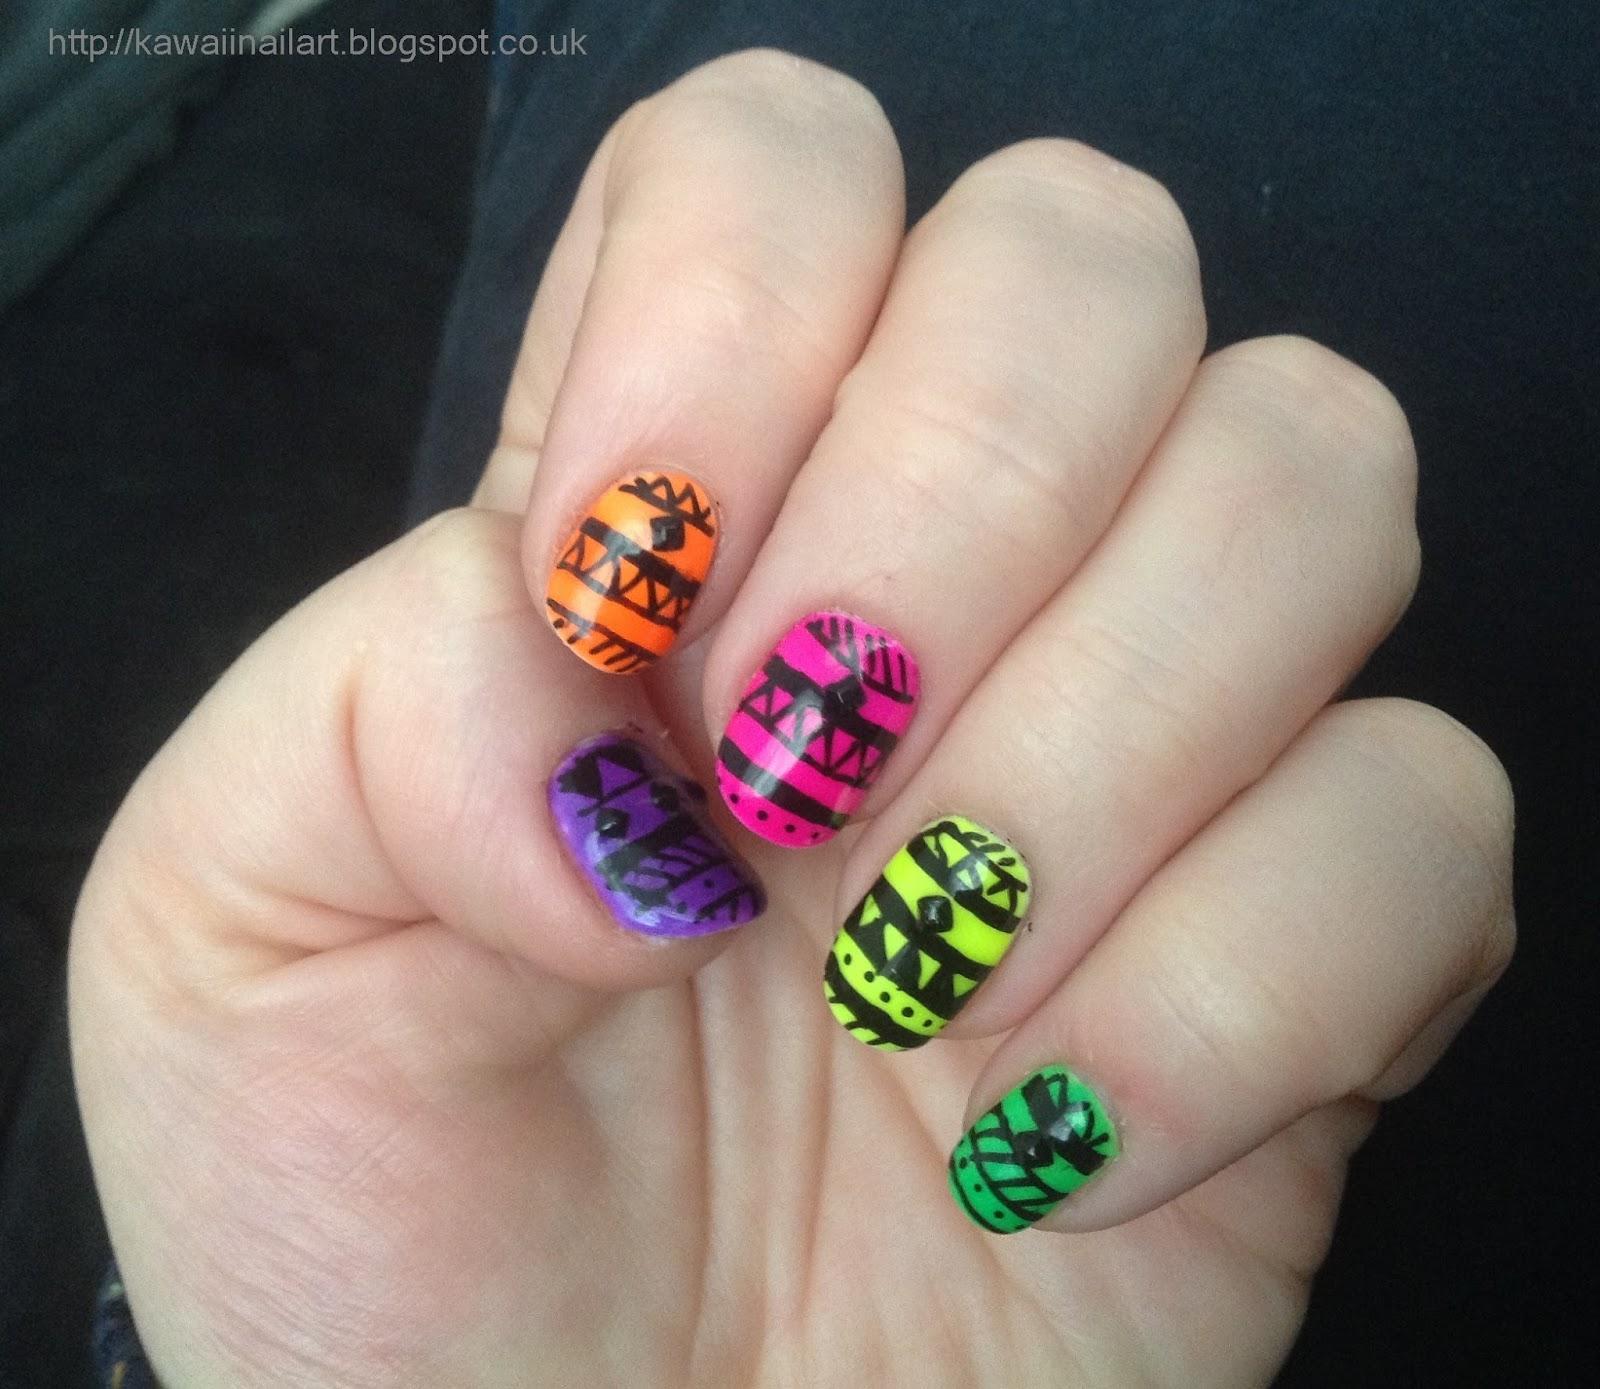 Kawaii Nail Art: Ibd Just Gel Neon Tribal Nail Art